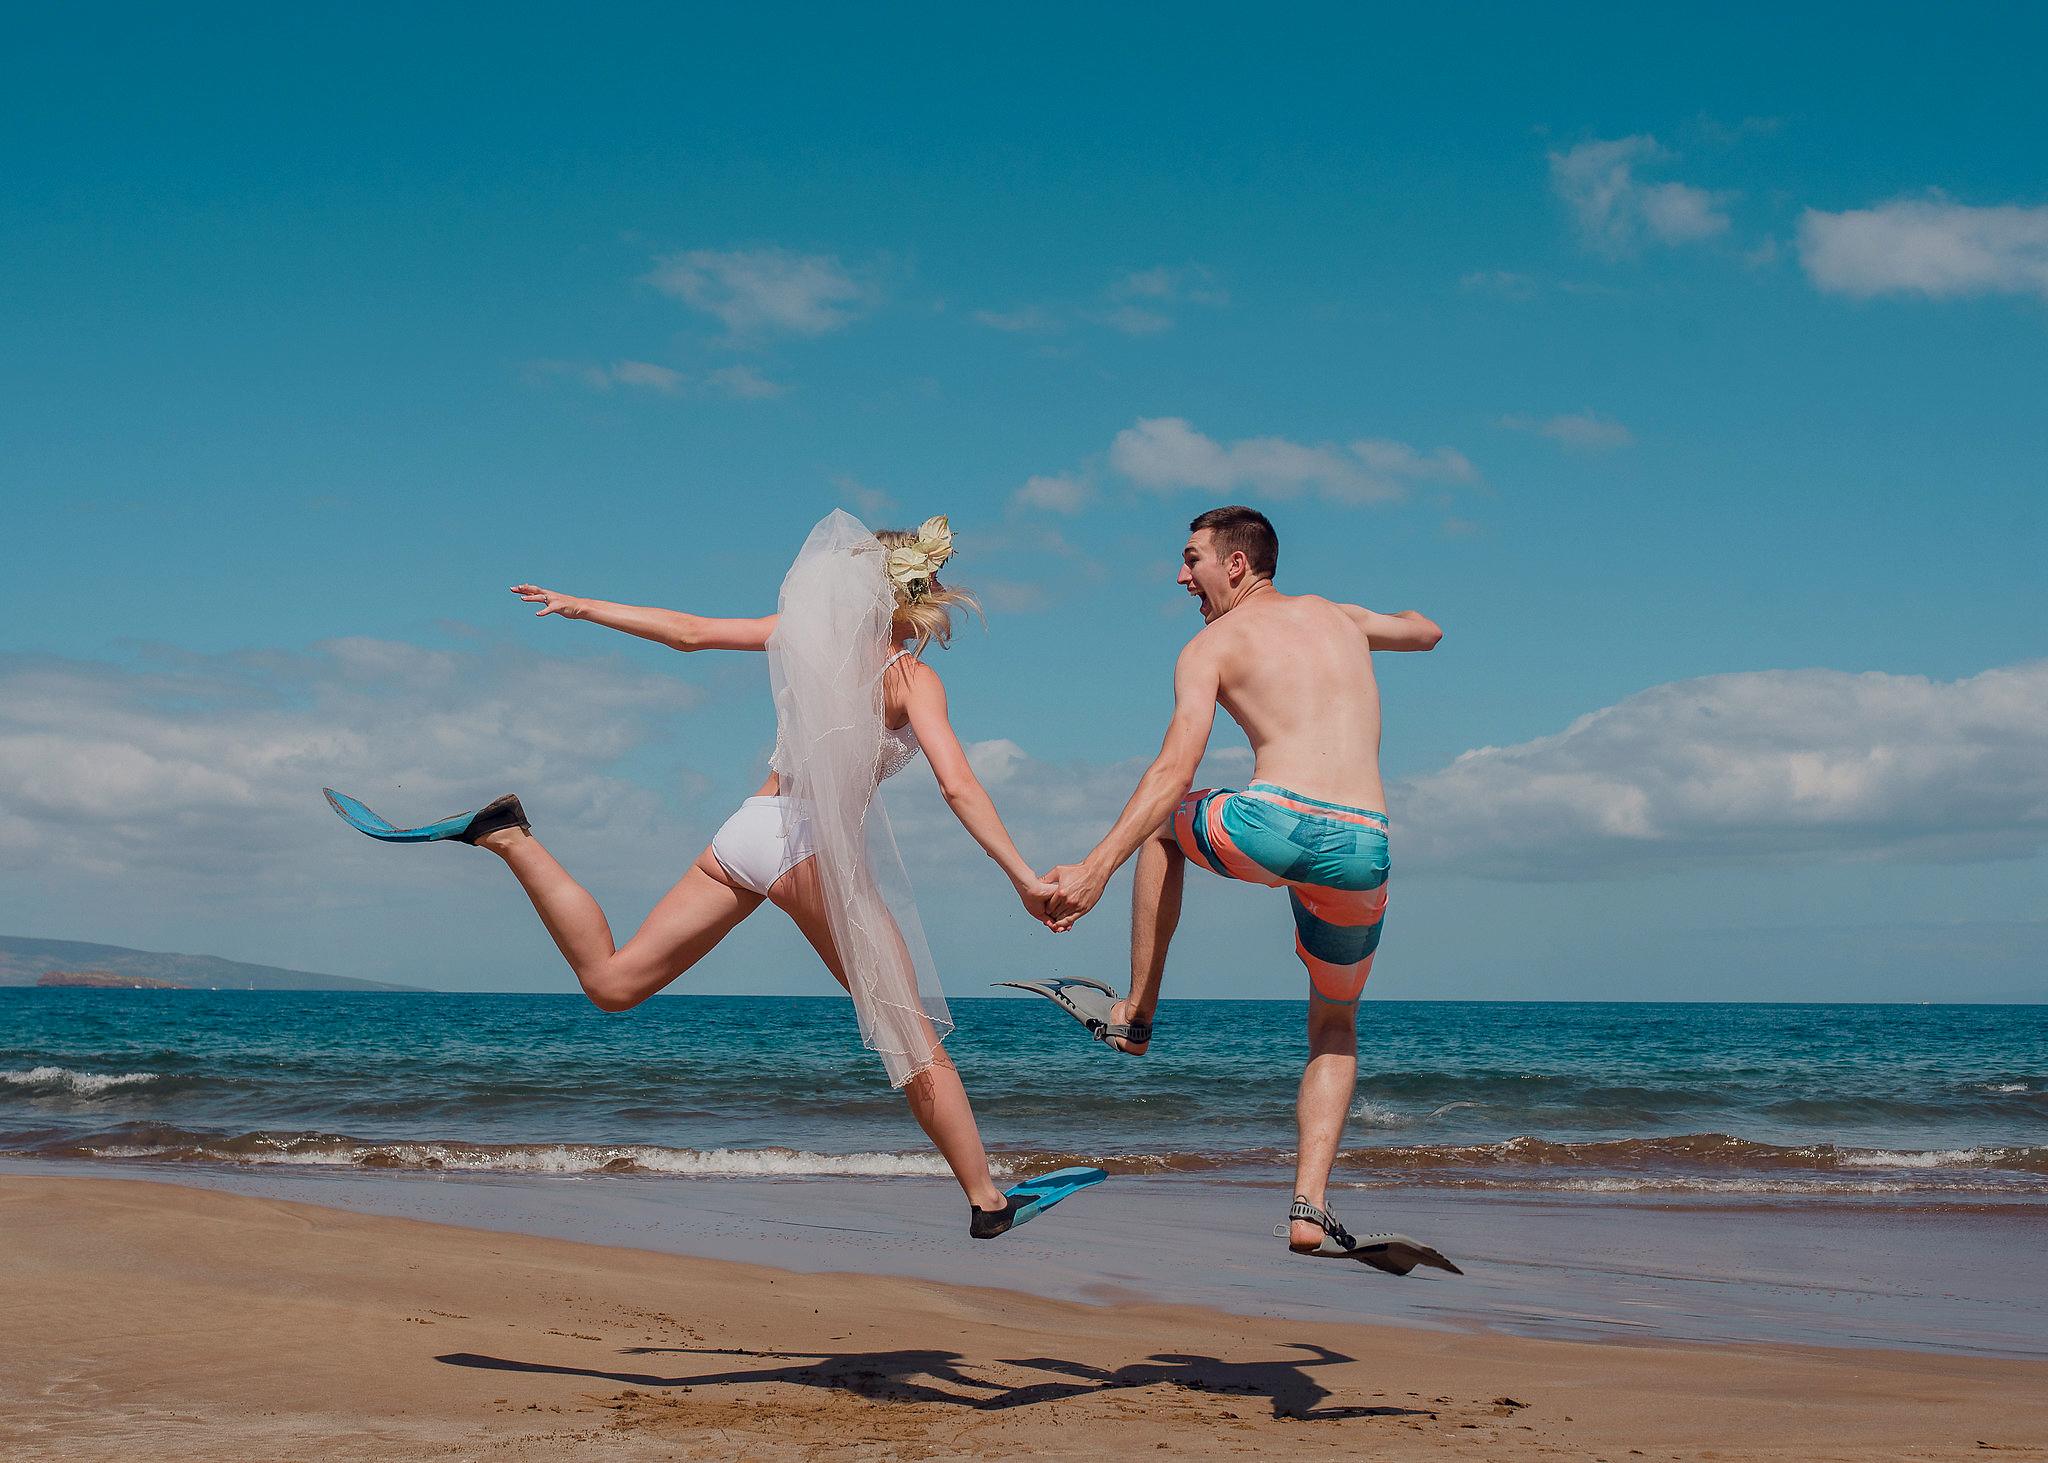 Most Inspiring Wedding and Elopement photographer of 2019